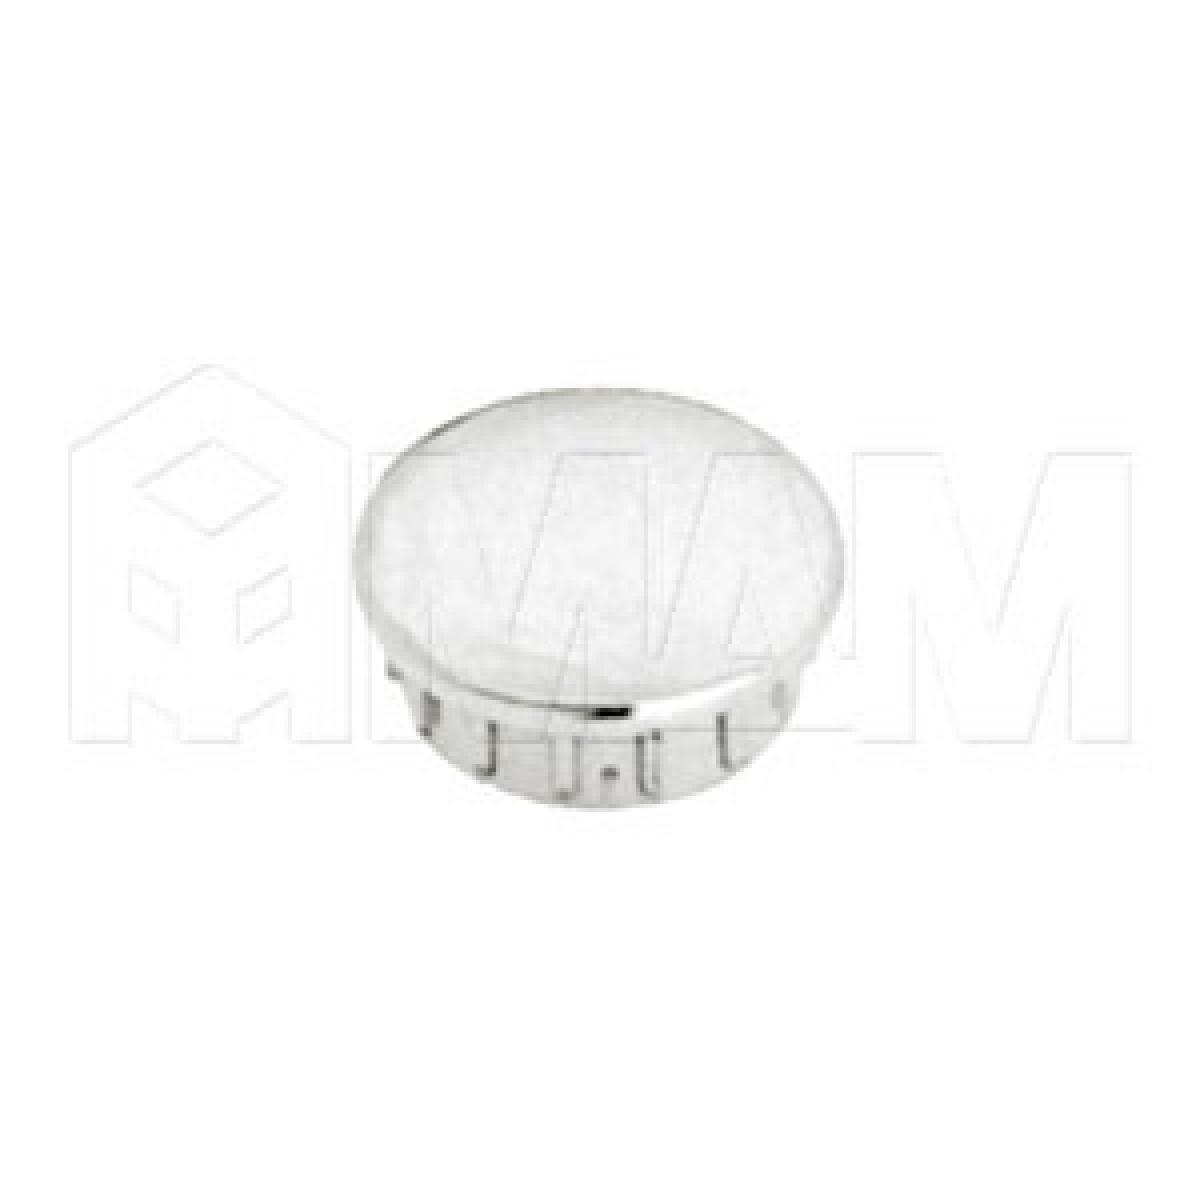 Заглушка (пластиковая, D=32мм) хром